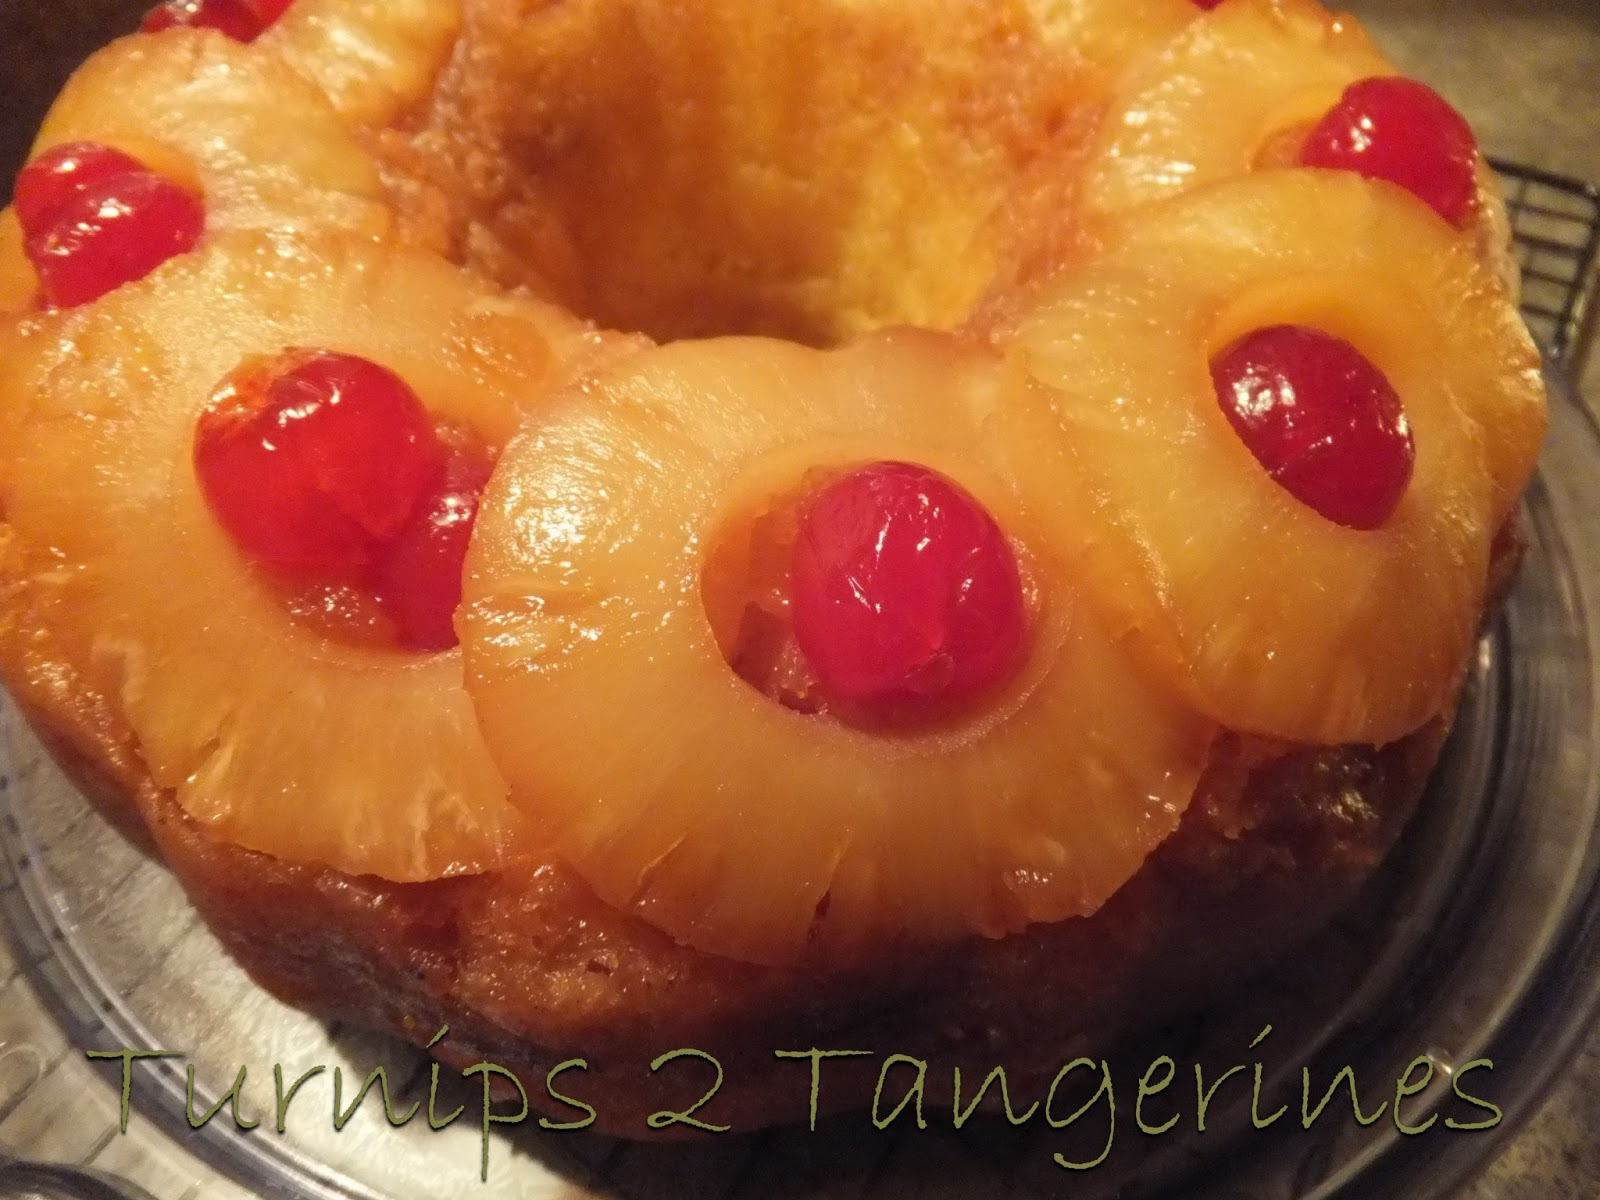 Pineapple Upside Down Bundt Cake Using Cake Mix